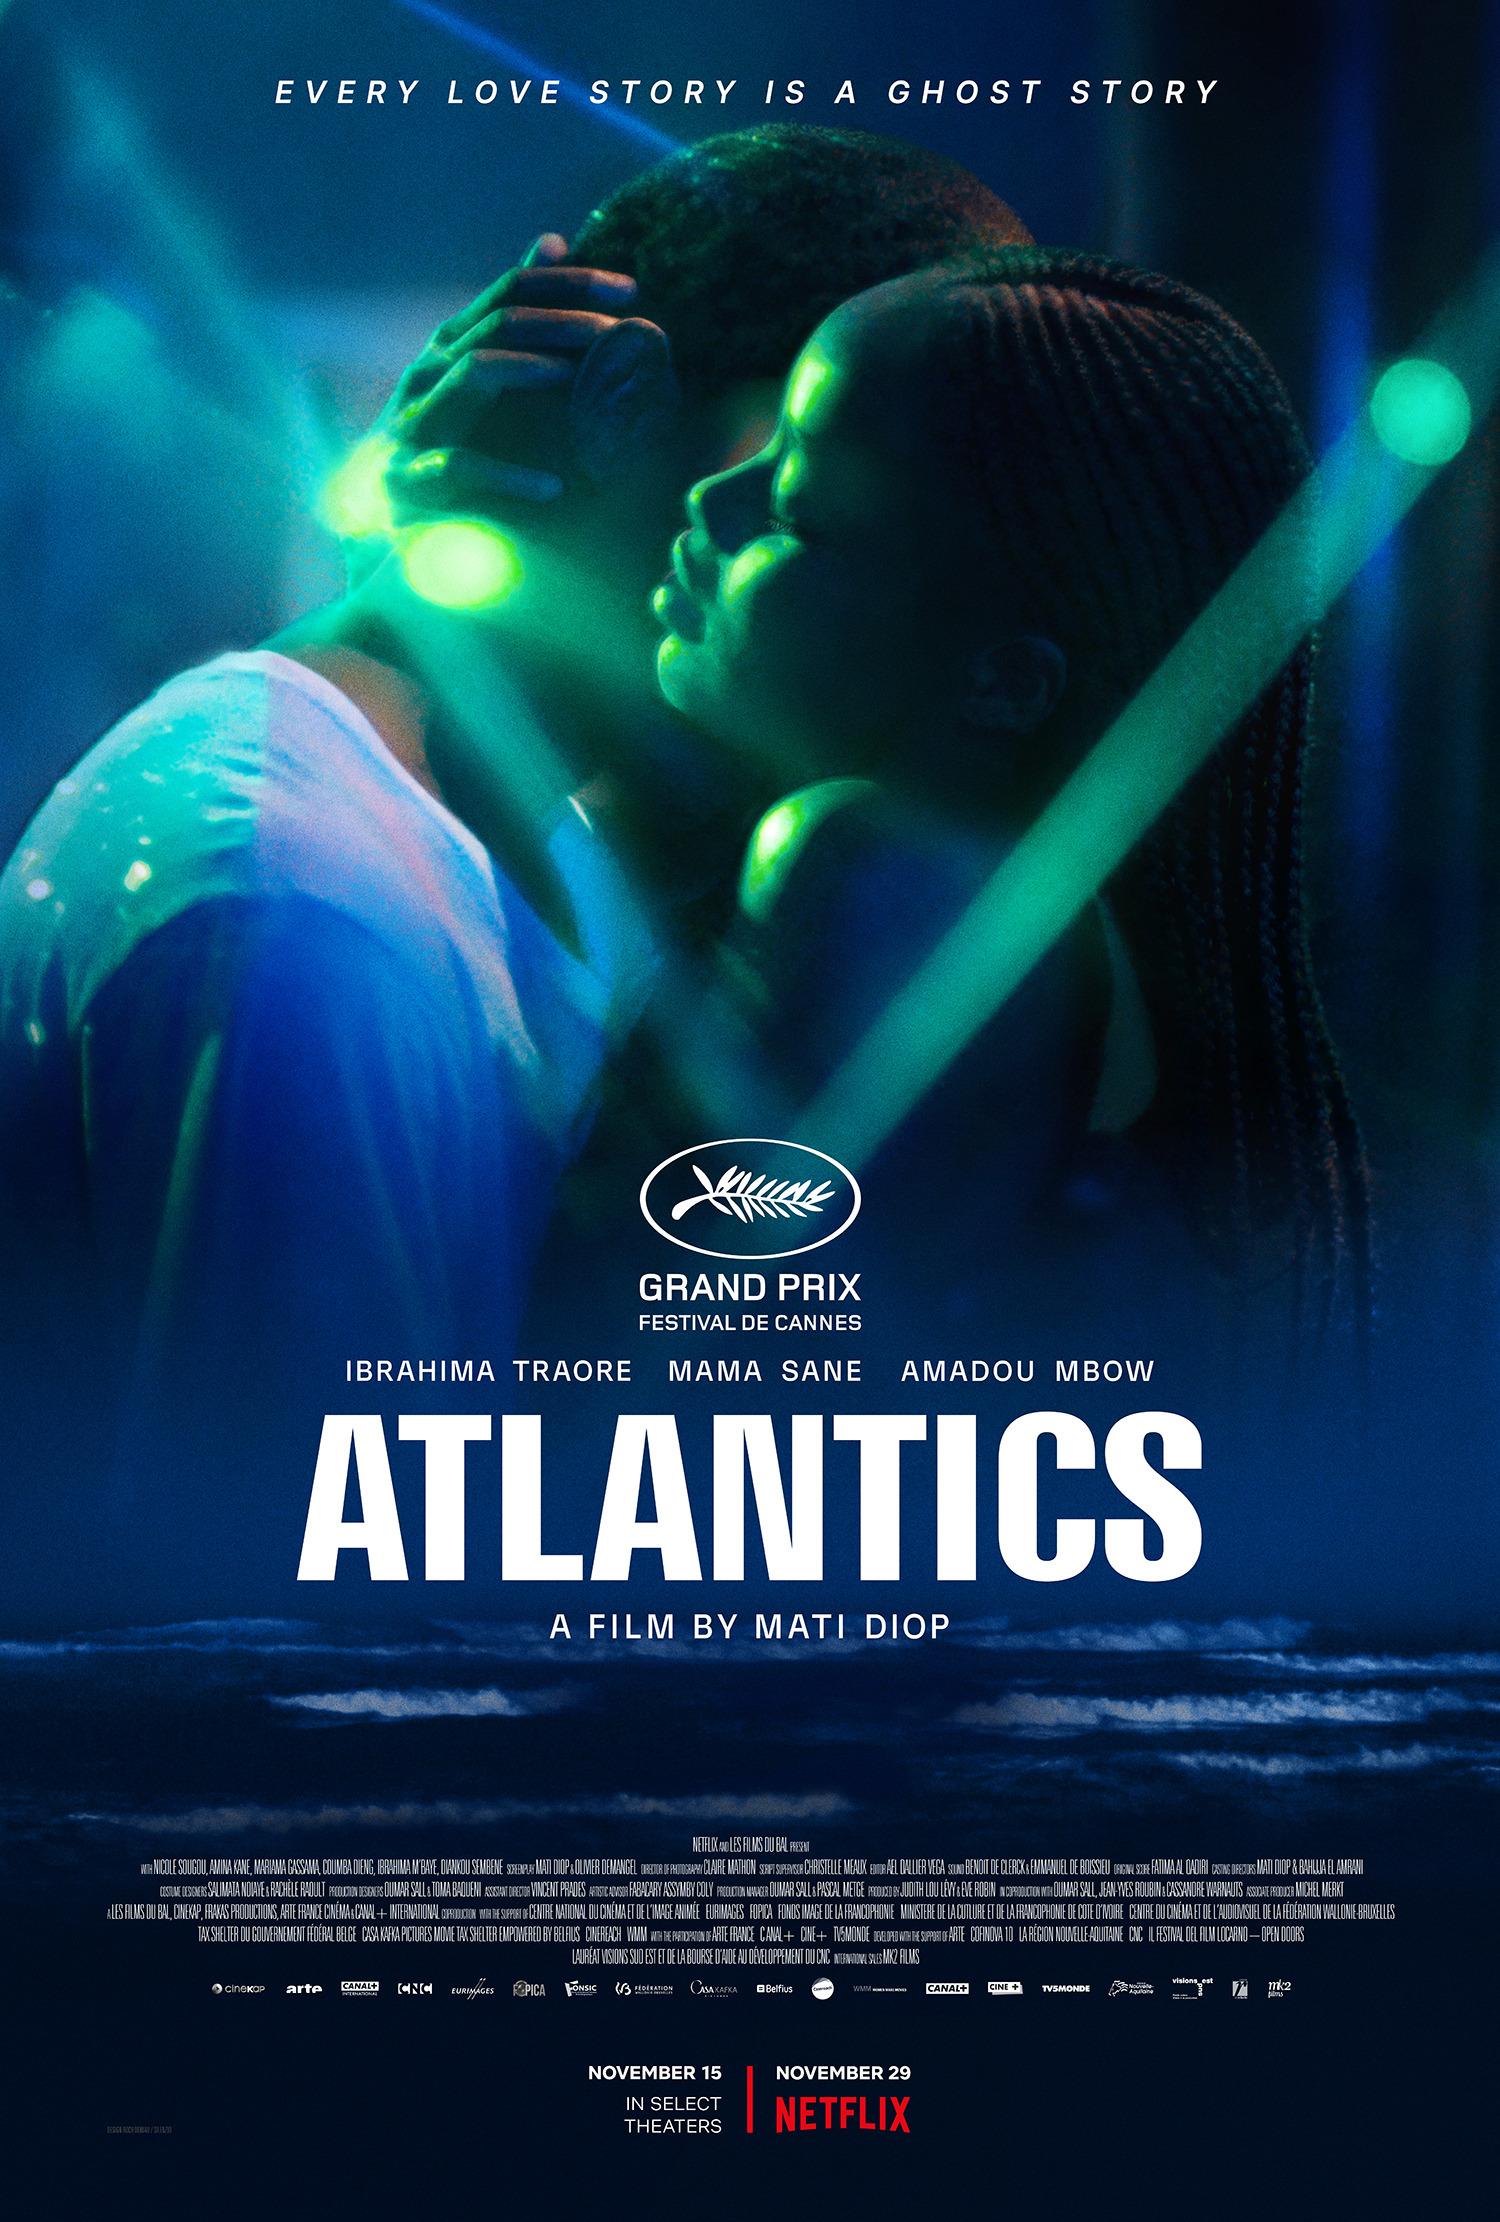 Atlantics (2019) fhd